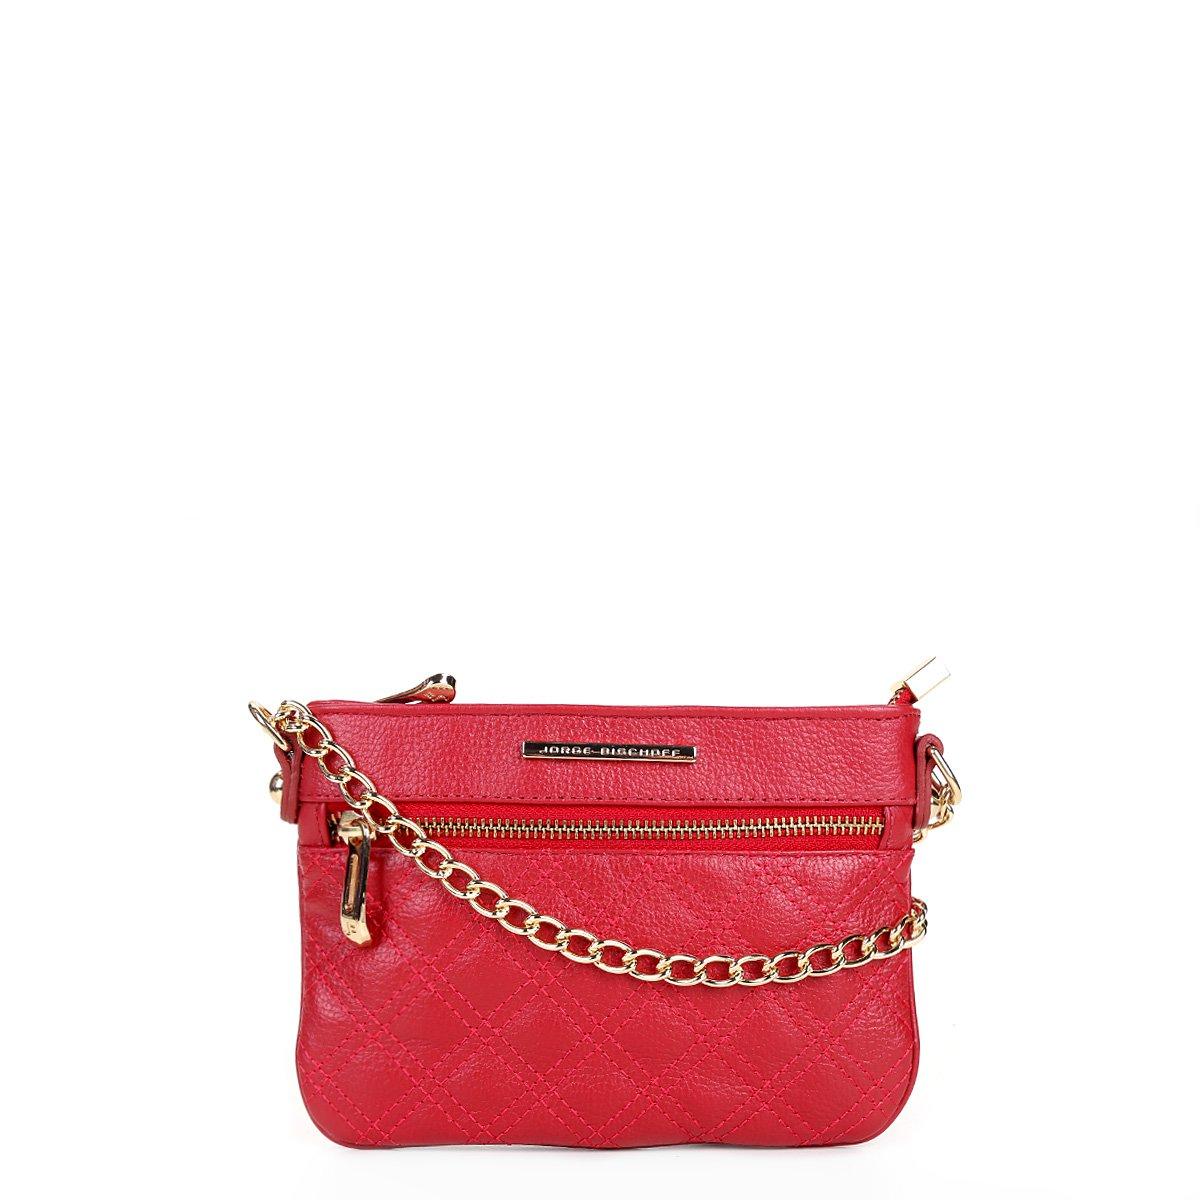 589c24a78 Bolsa Couro Jorge Bischoff Mini Bag Basic Feminina